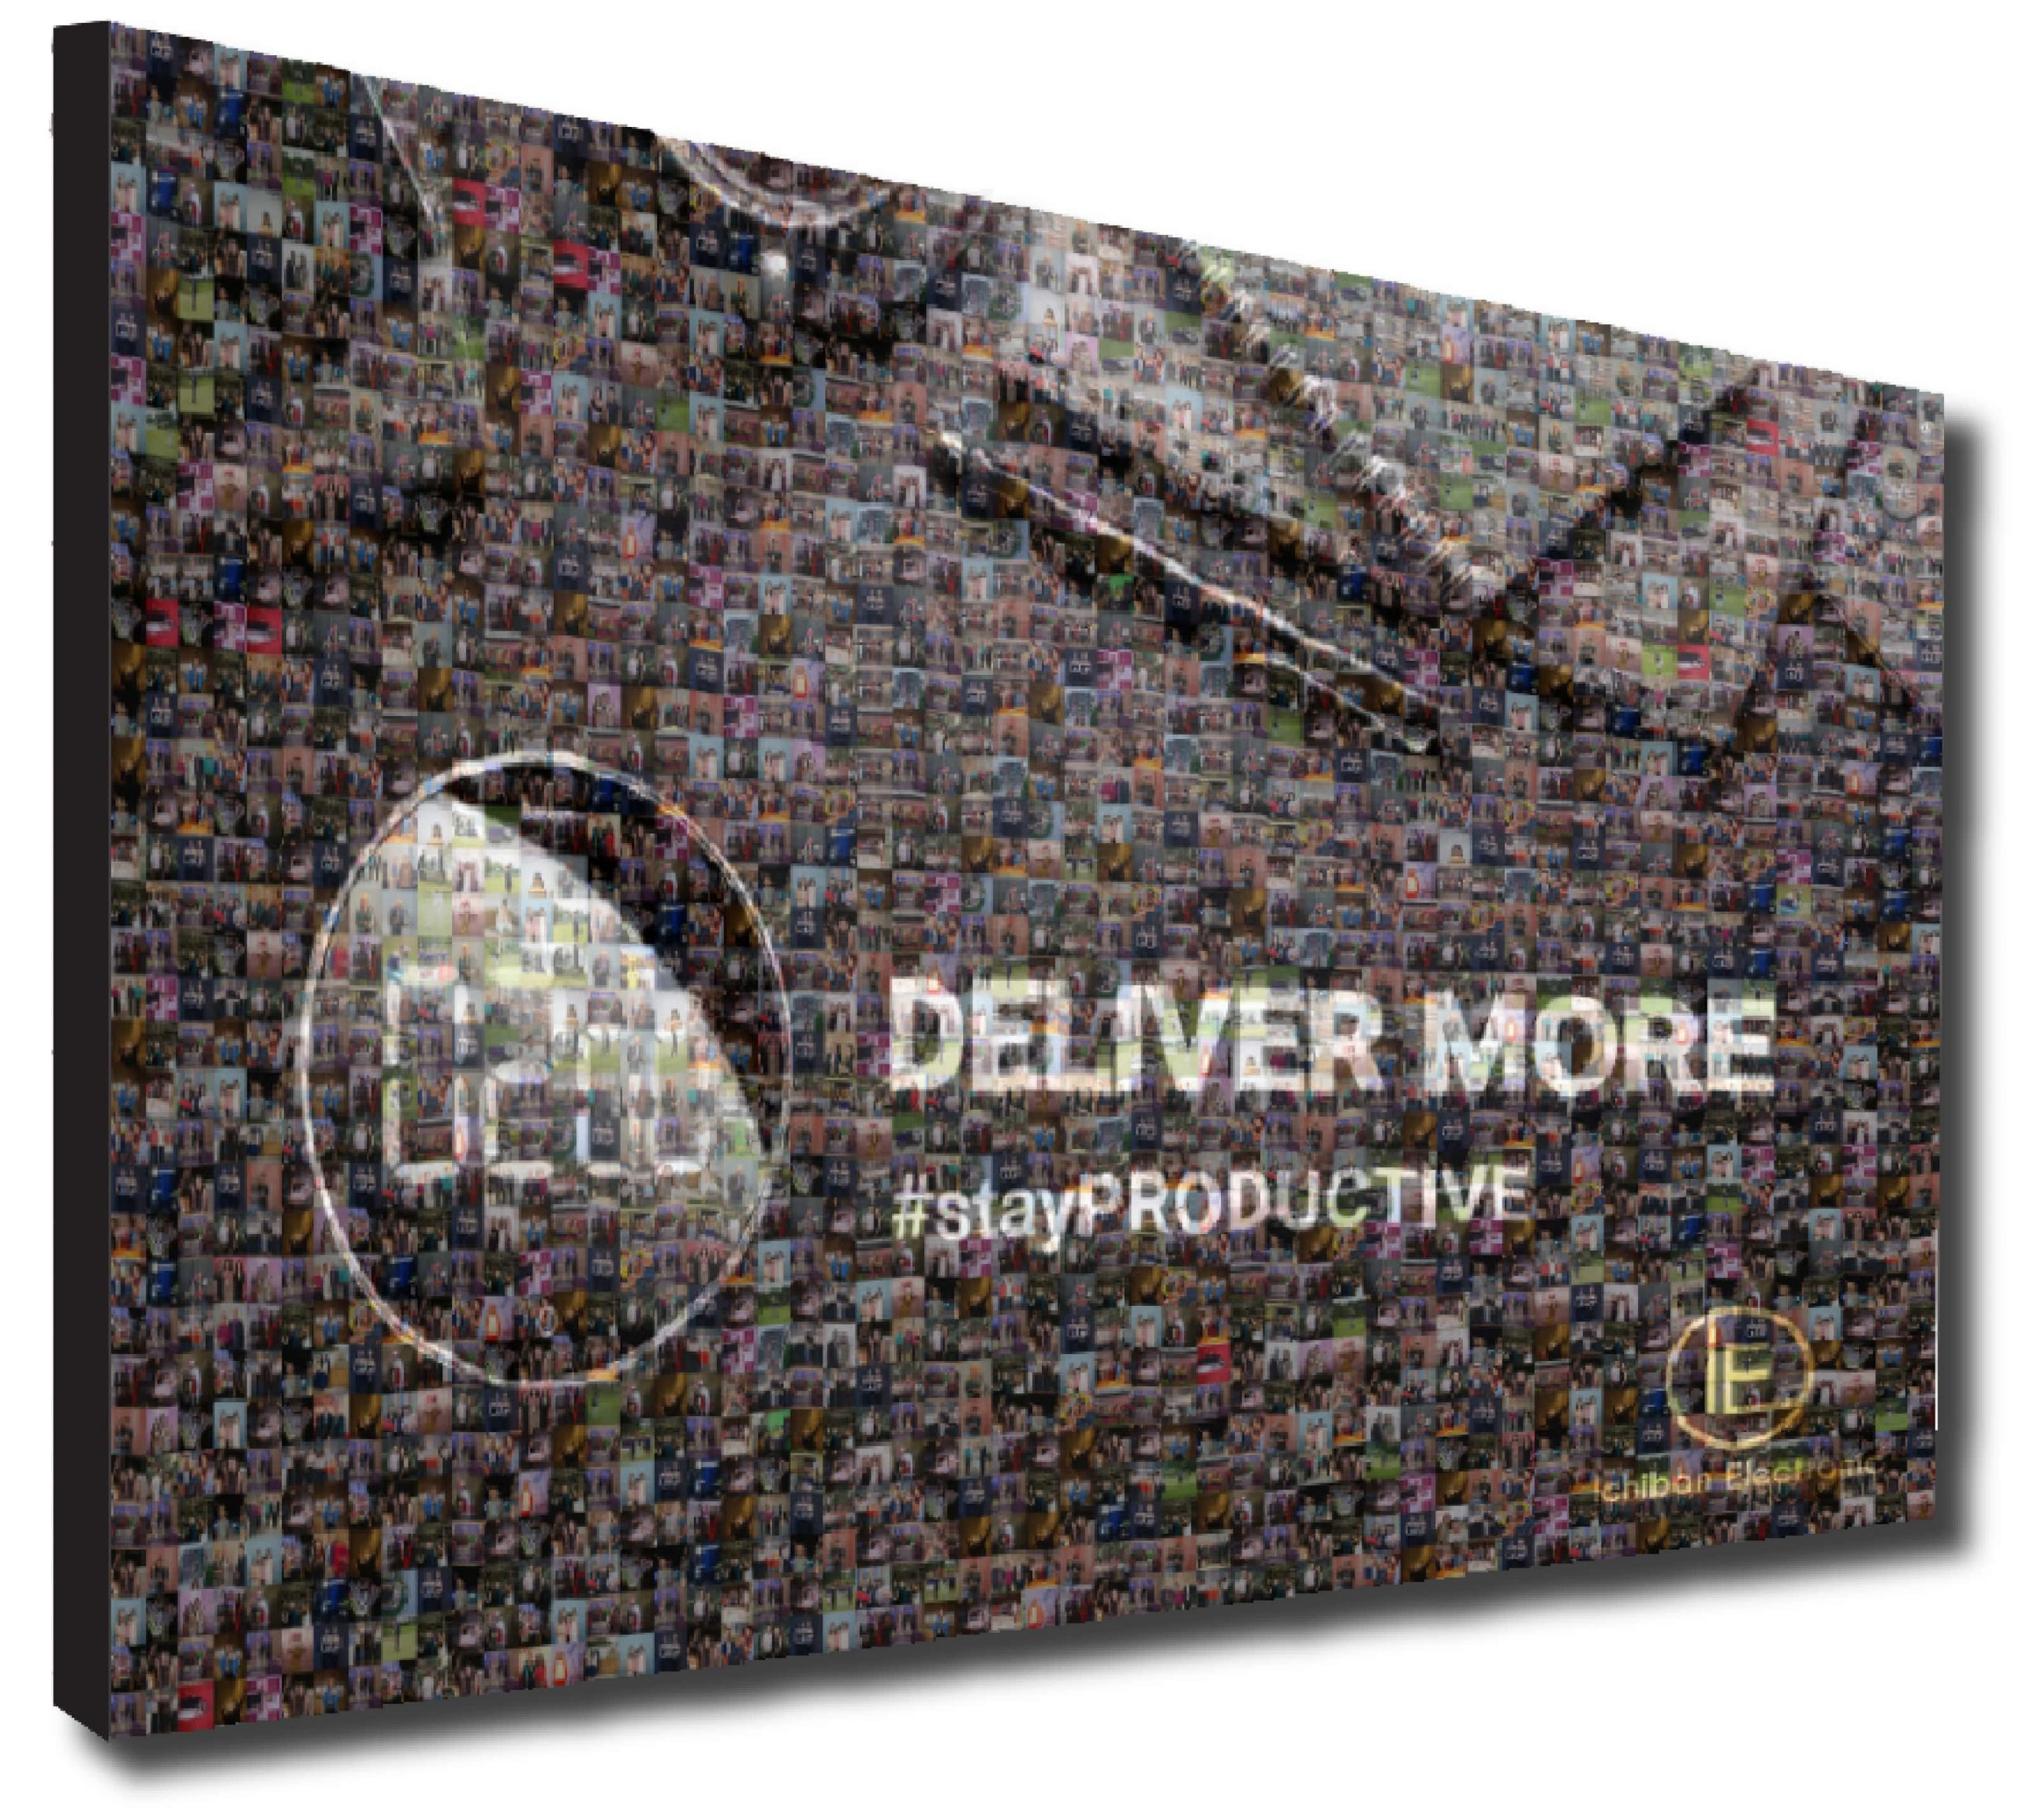 Virtual Mosaic Photo Booth